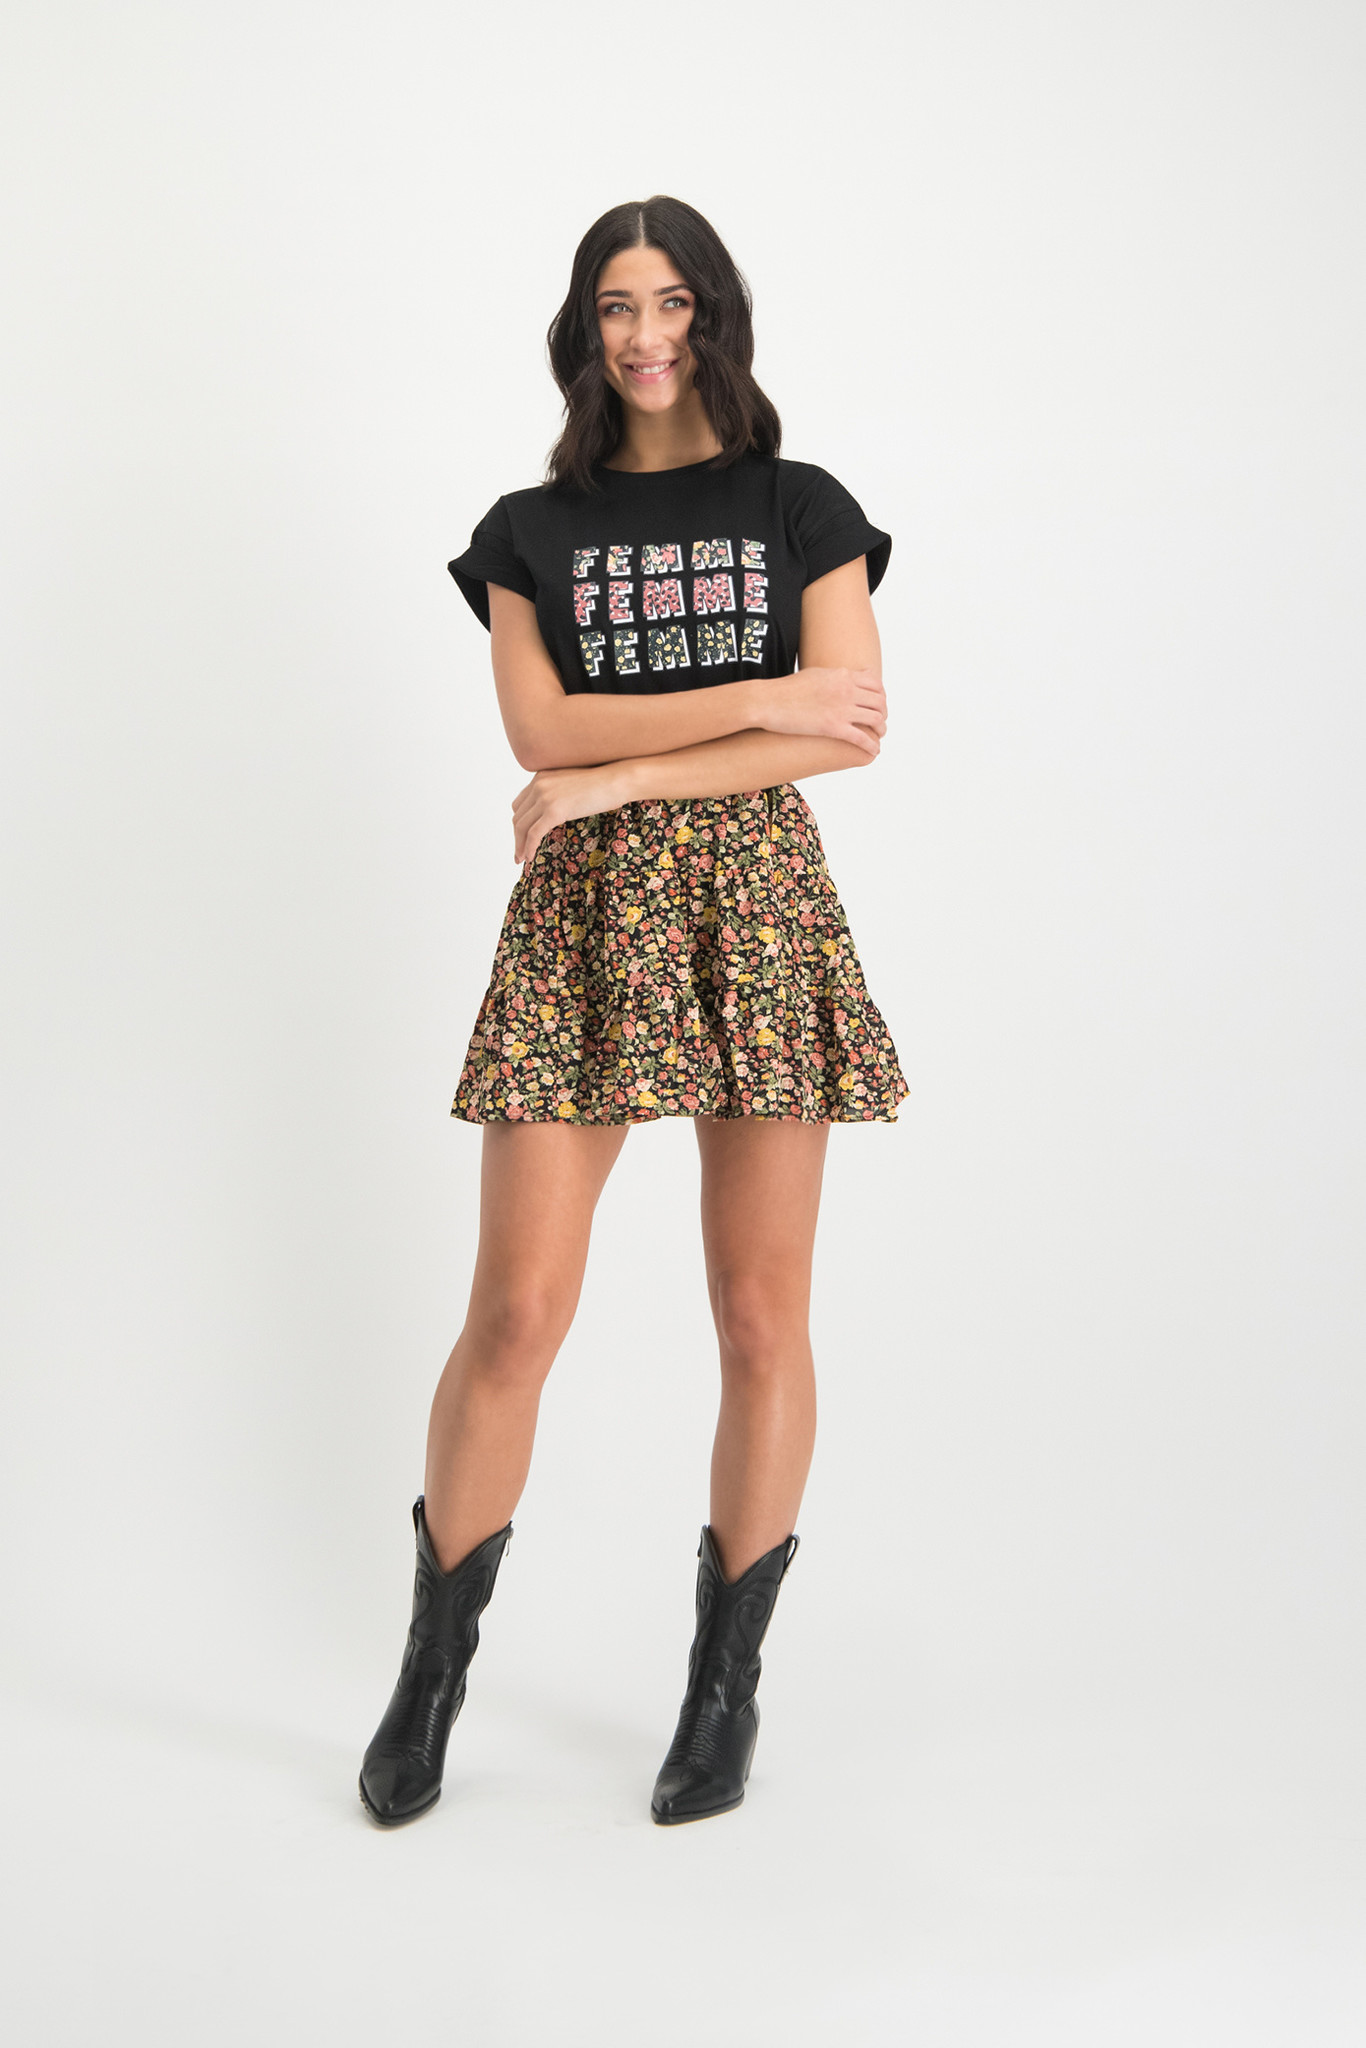 Lofty Manner Black Top Daria